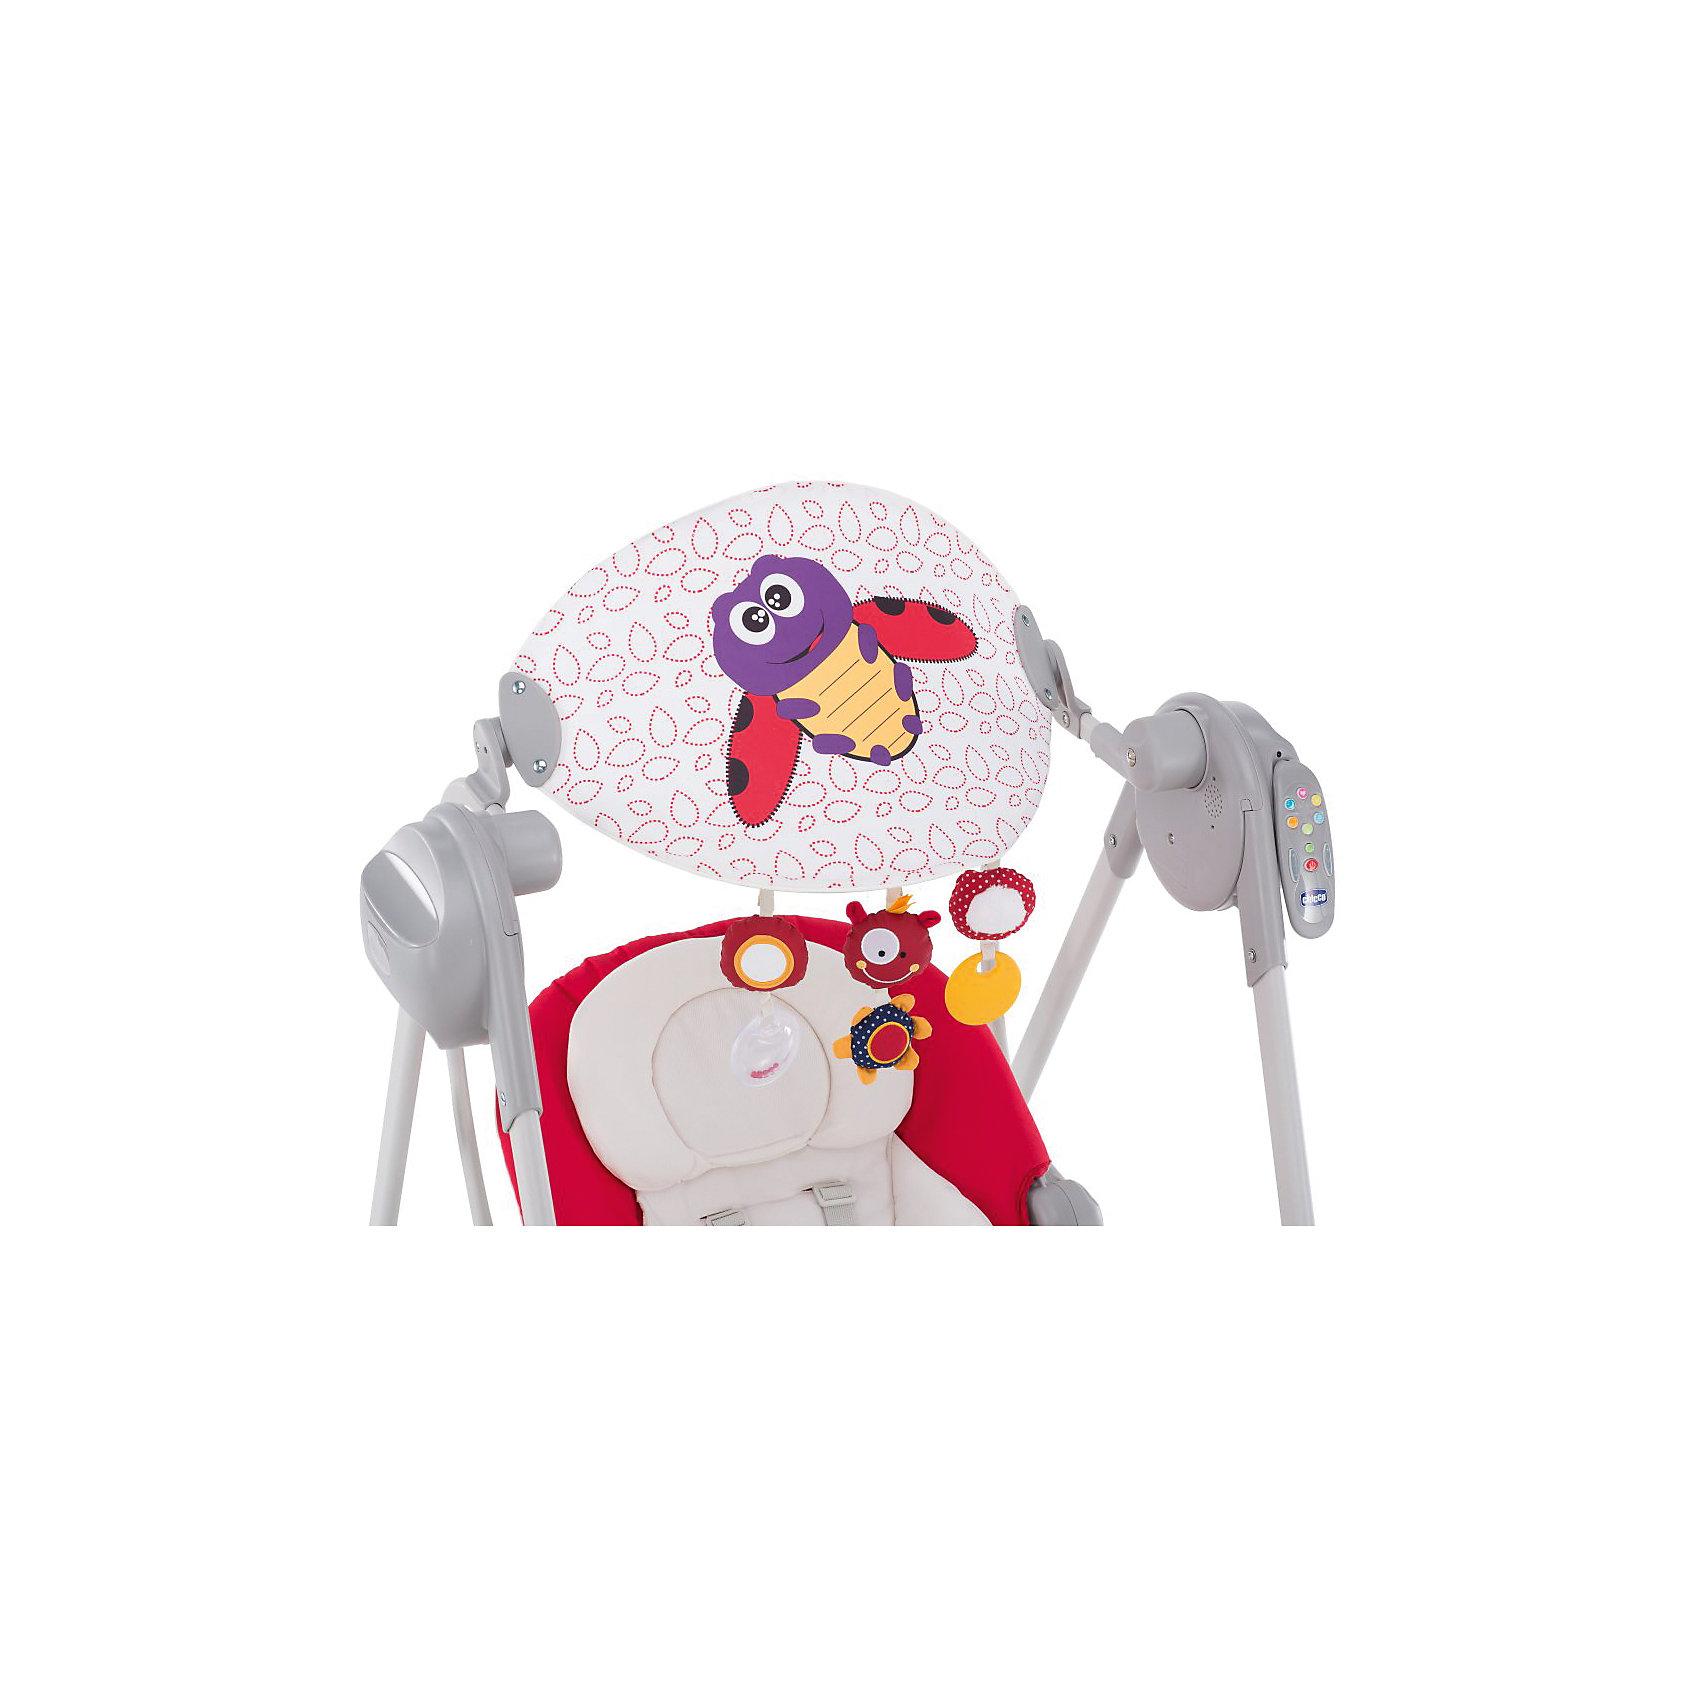 Электрокачели Polly Swing Up, Chicco, красный (CHICCO)